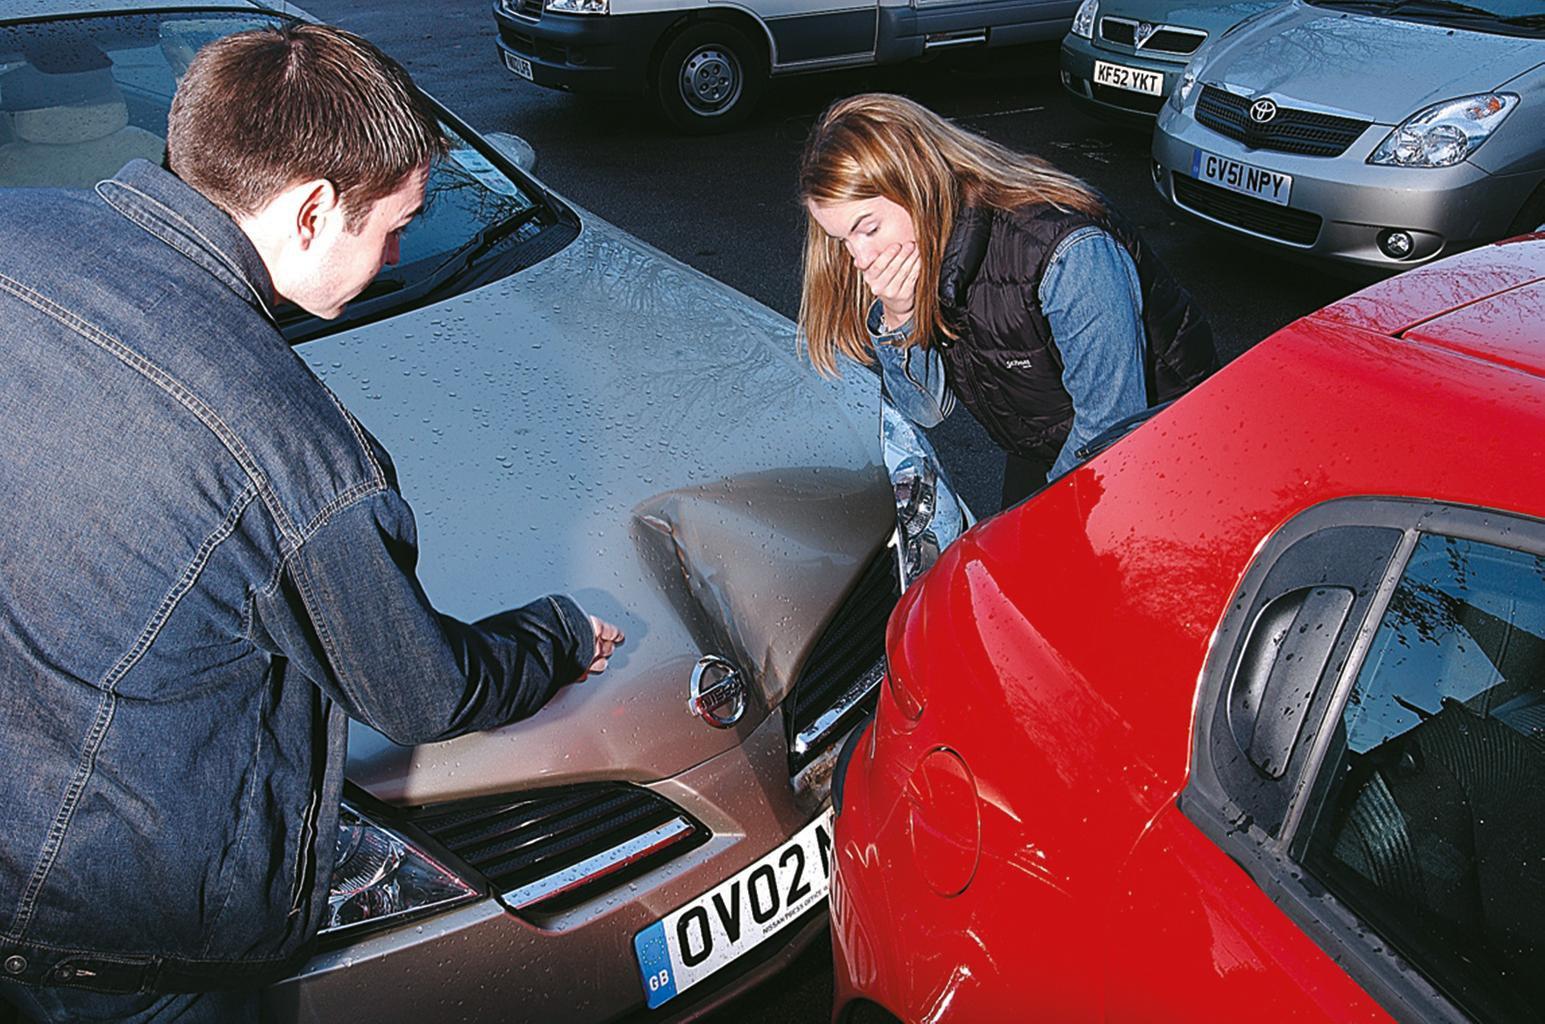 Crash-damaged cars: everything you need to know